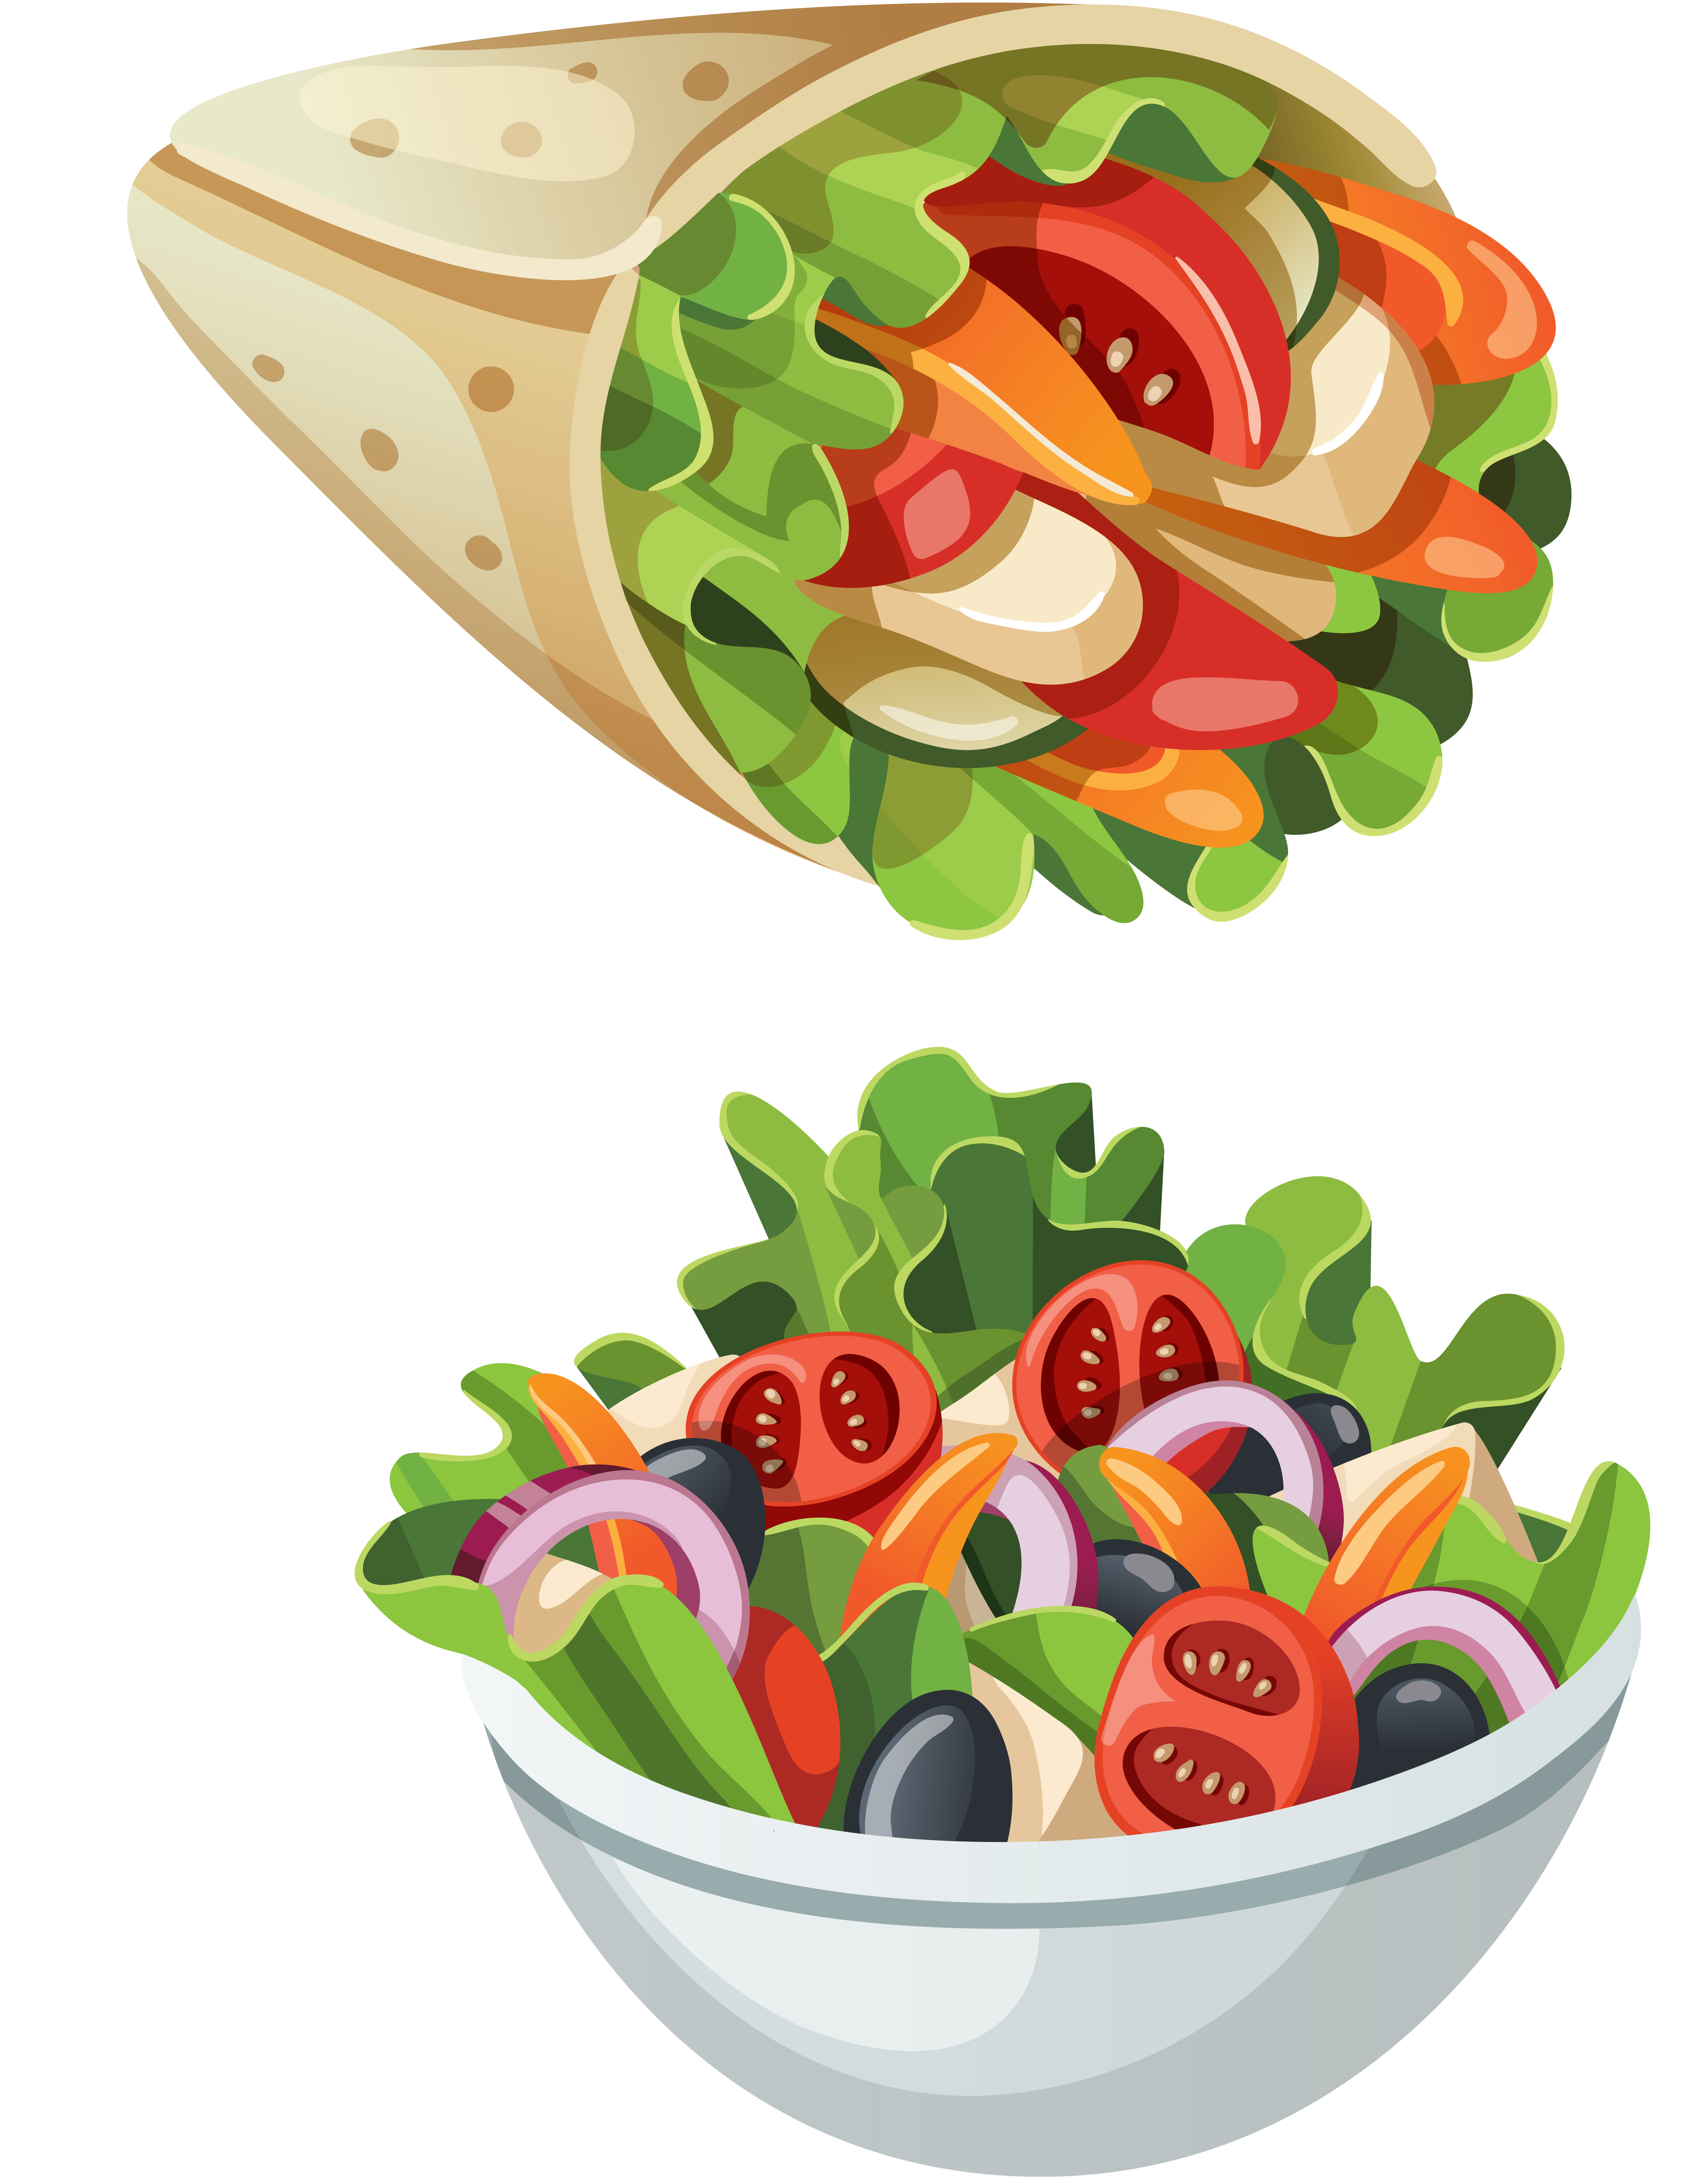 Dishes clipart vegetable salad, Dishes vegetable salad ...